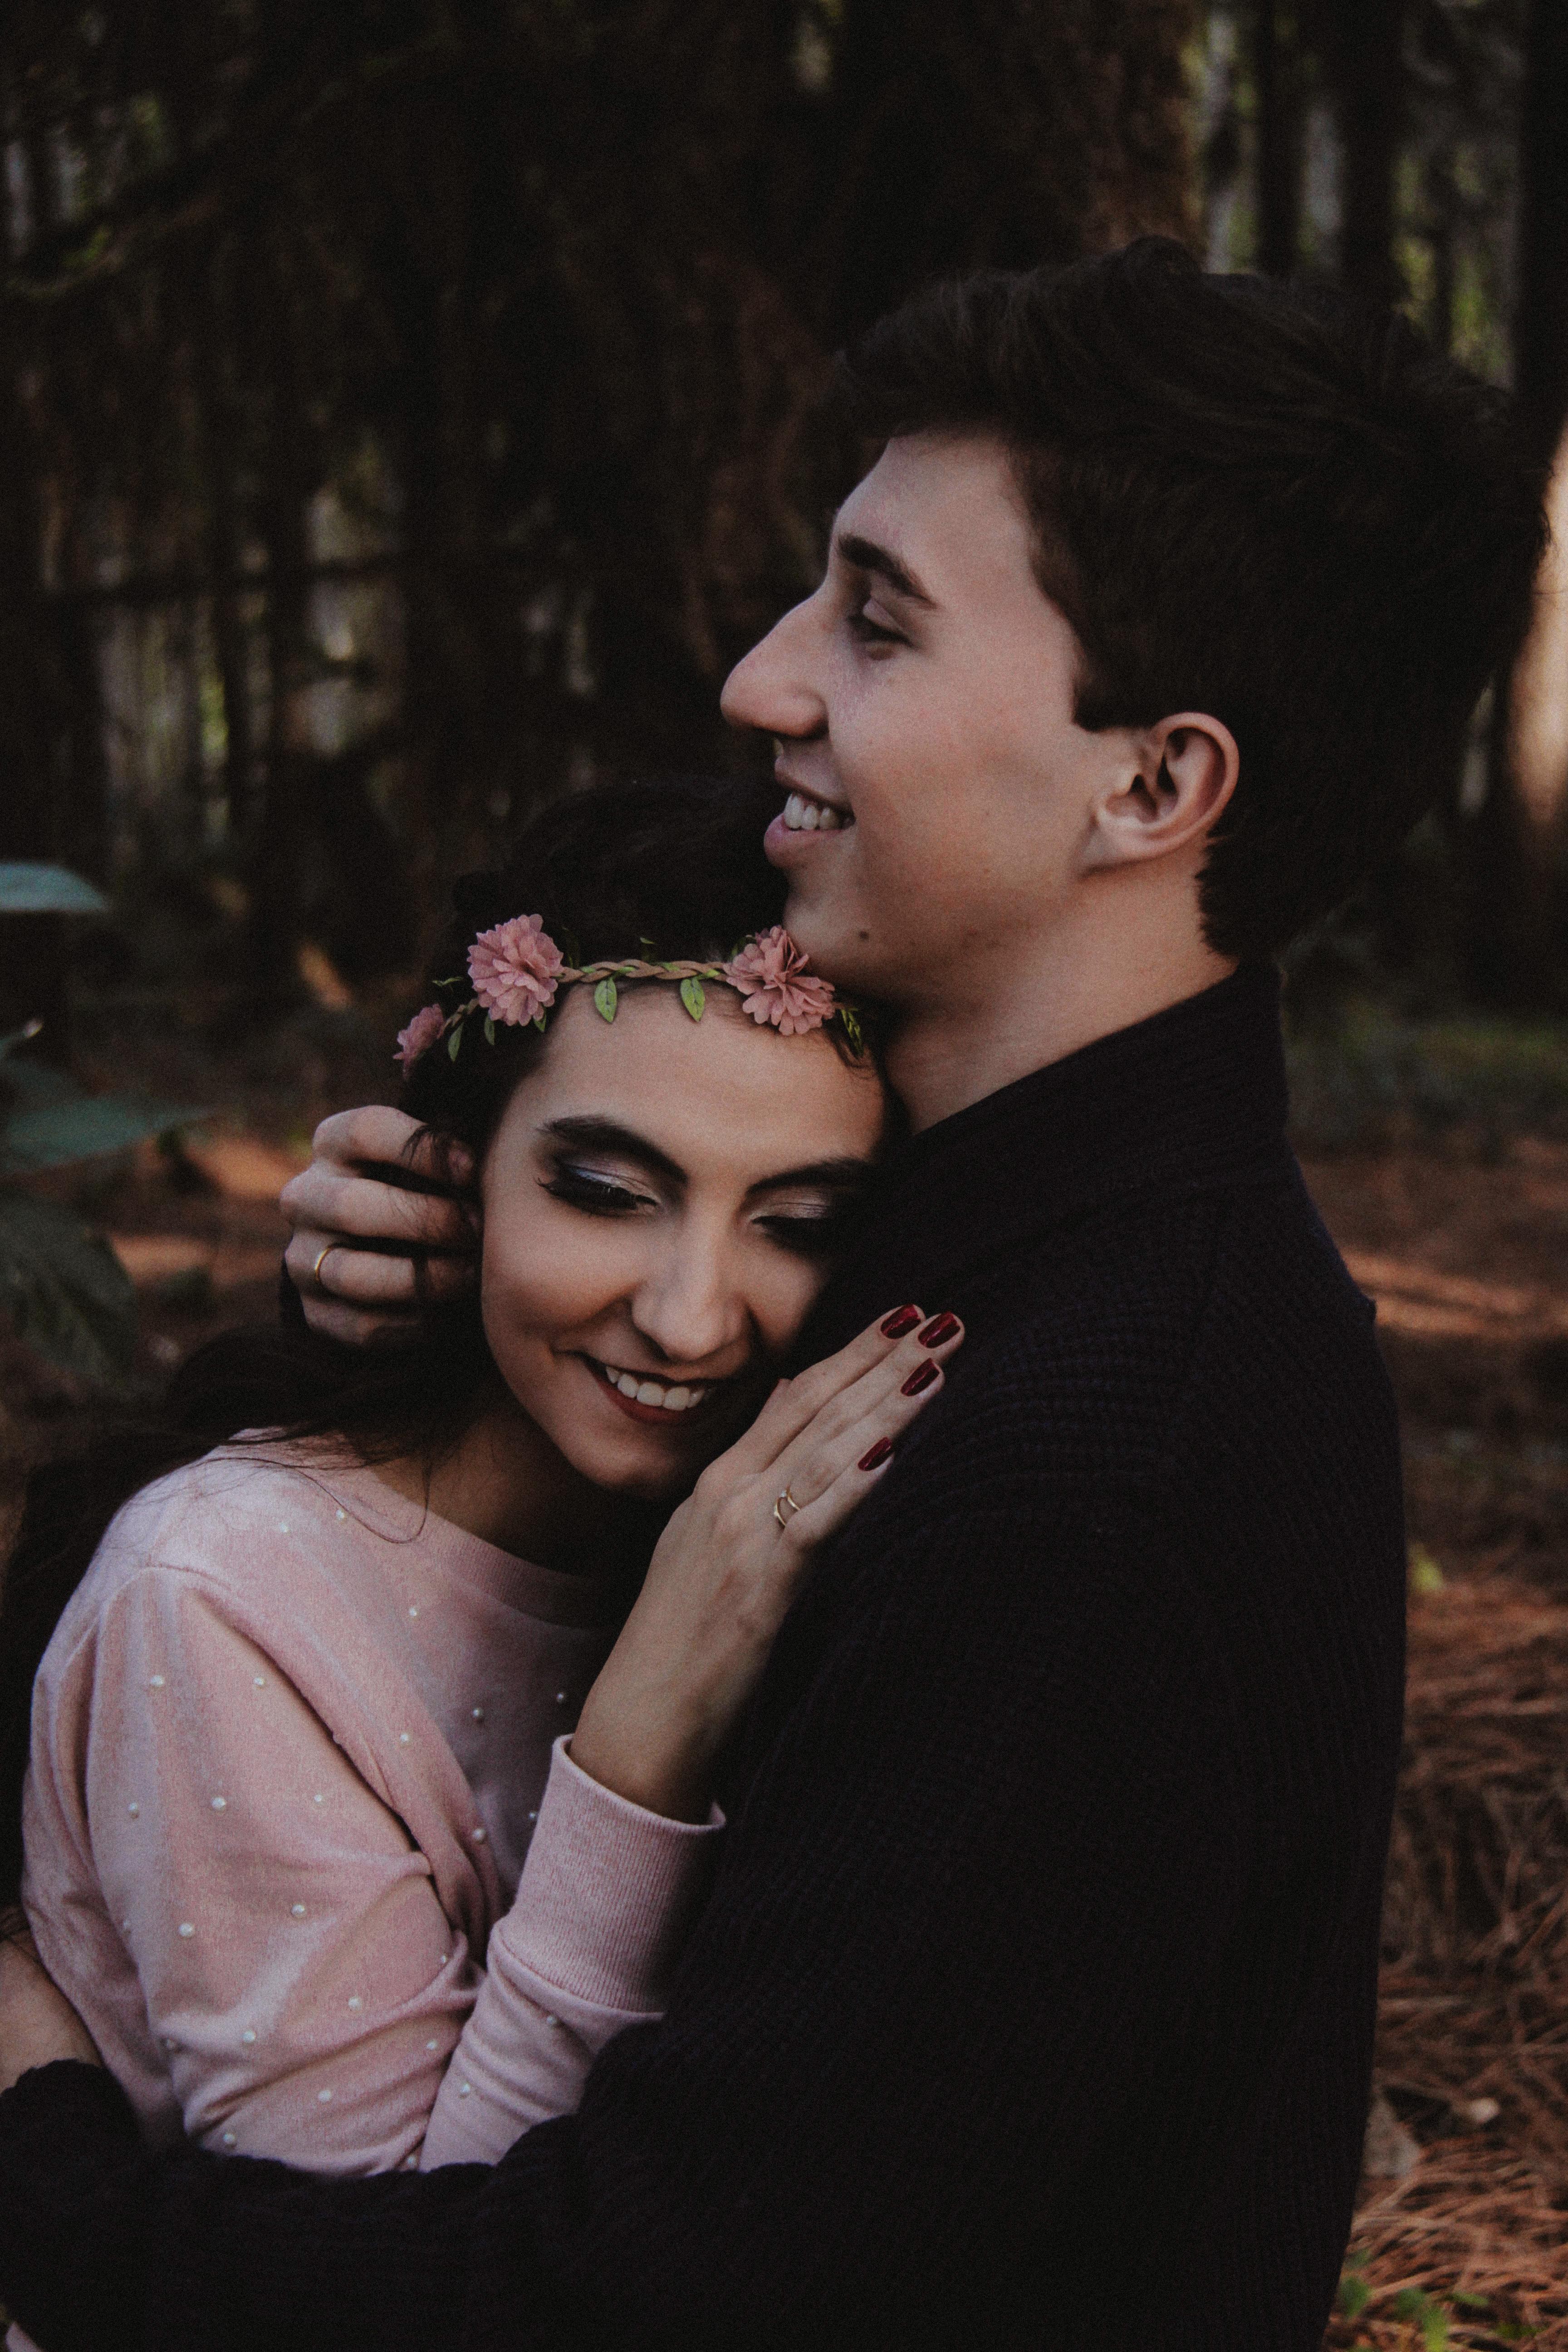 dating par fotografering DotA 2 rangert matchmaking formel